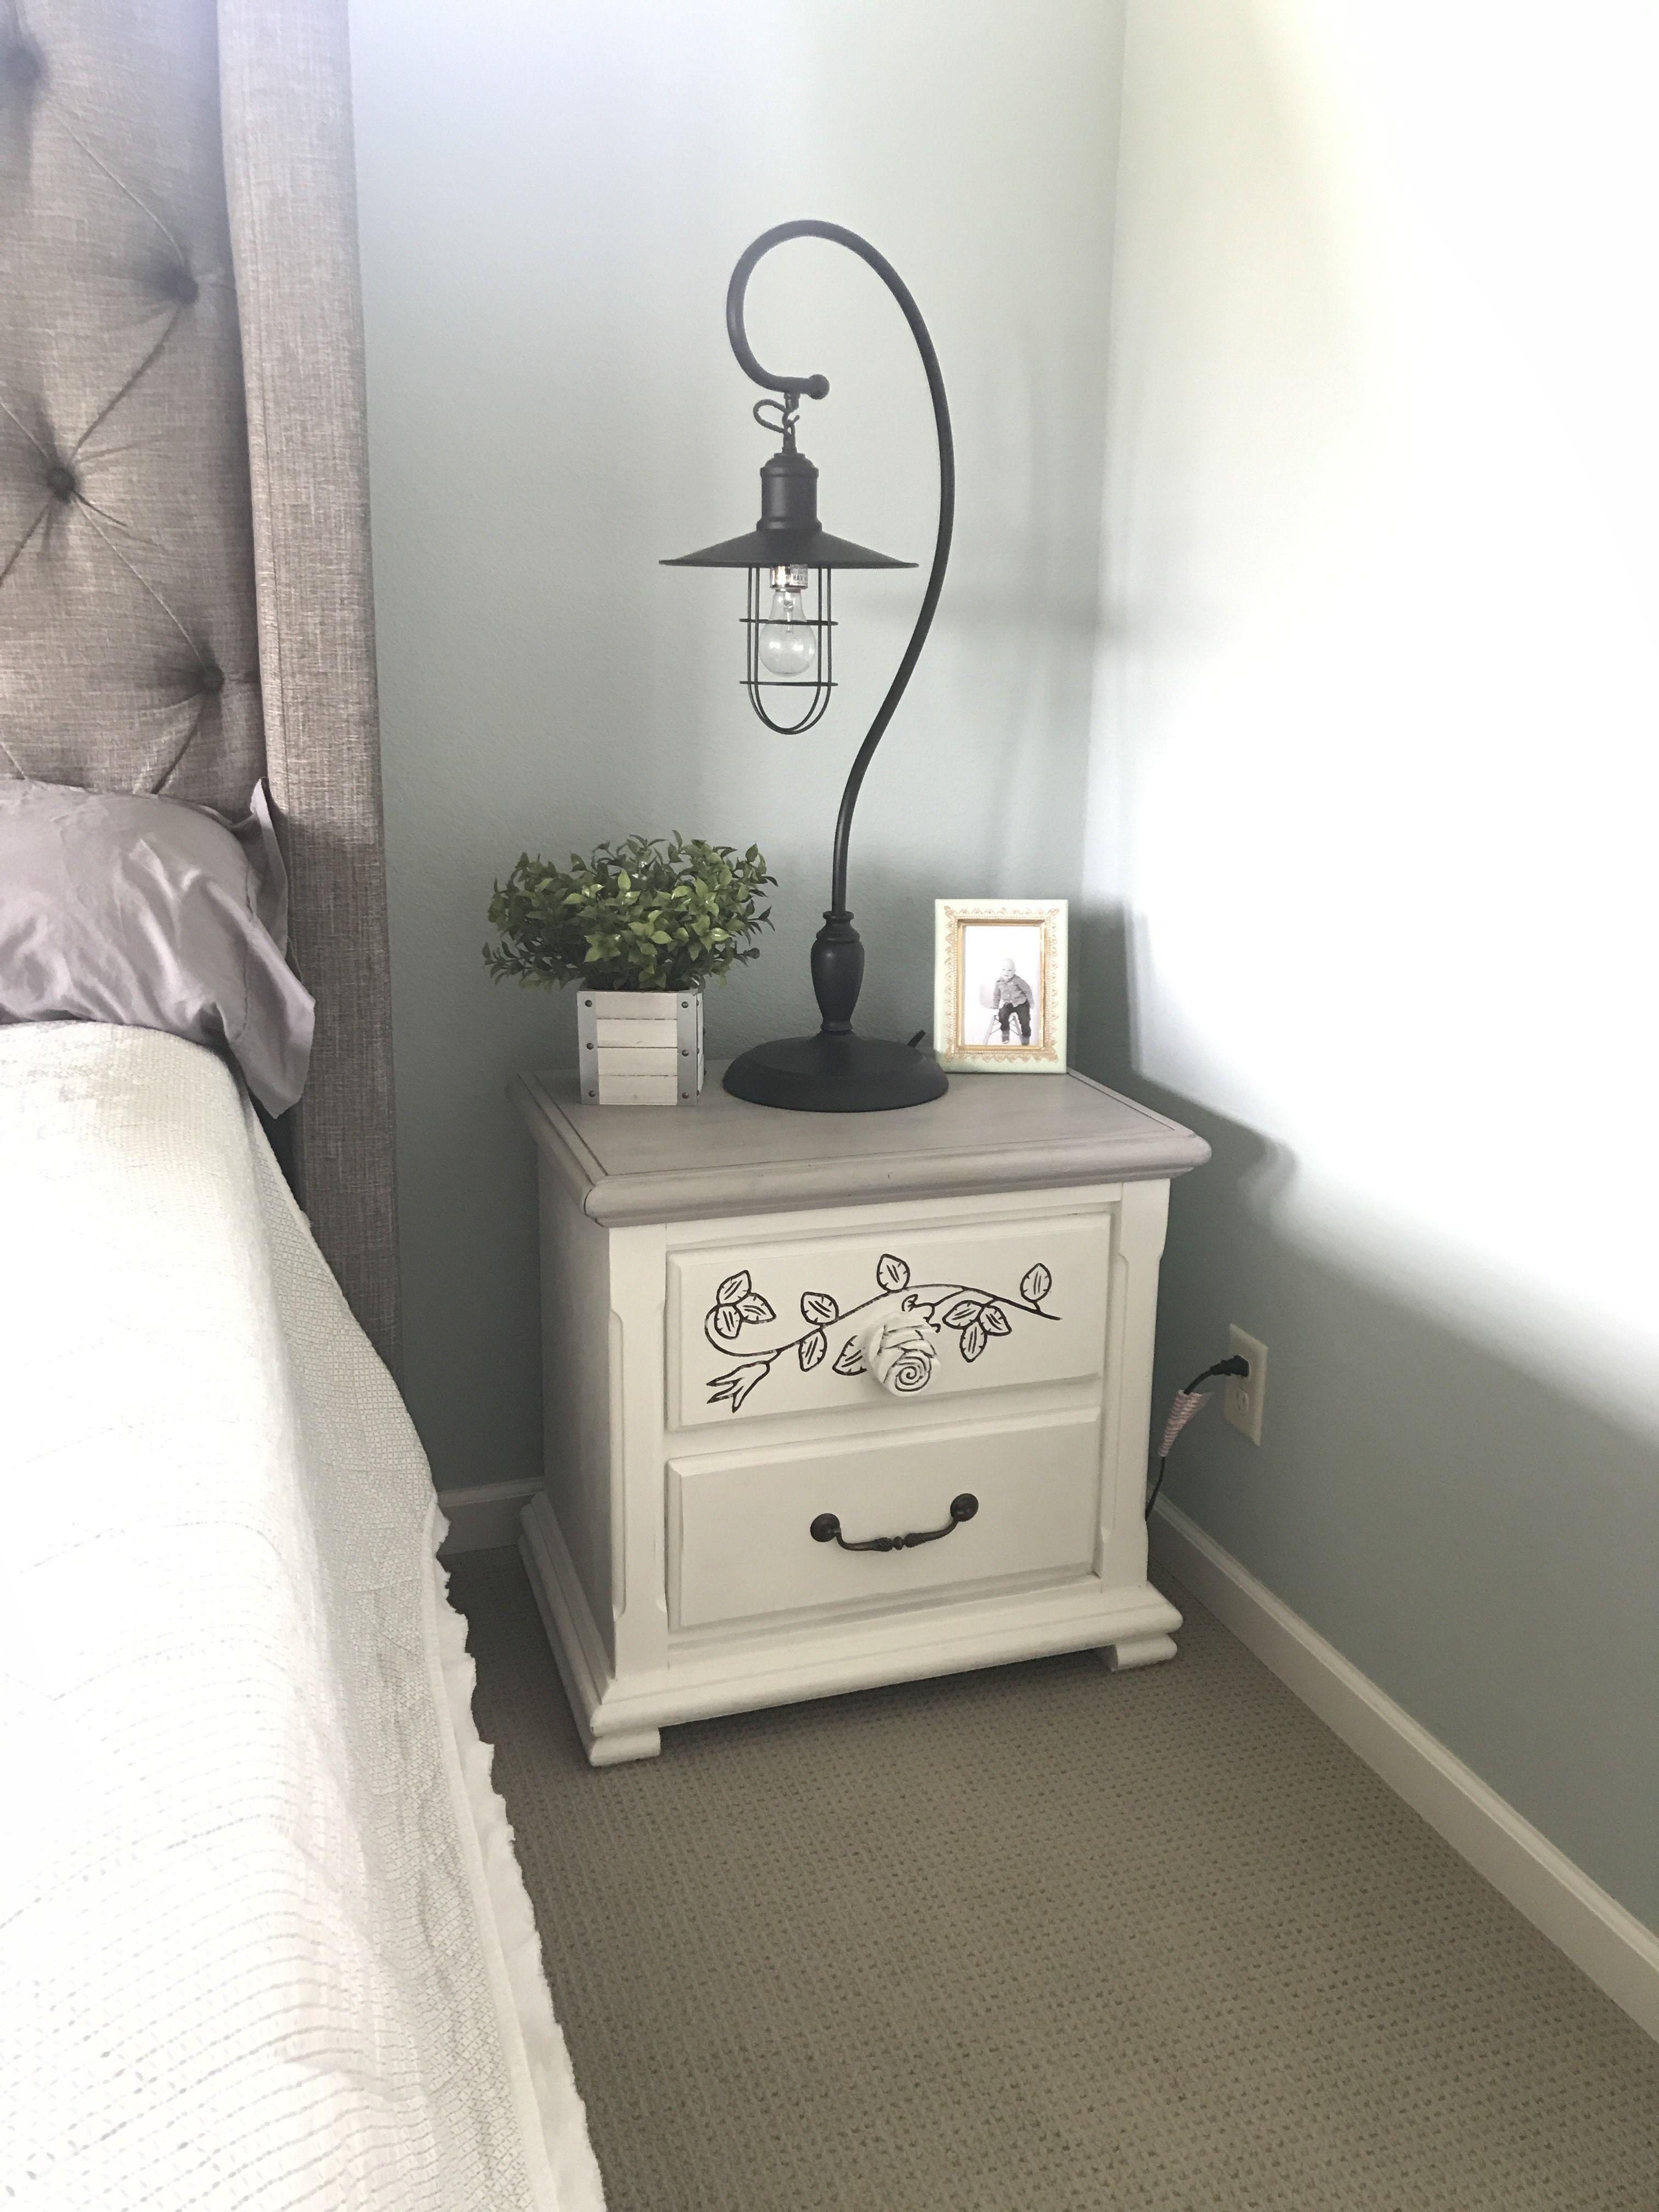 shabby chic furniture bedroom. DIY, Nightstand Rehab, Chalk Paint Inspiration, Shabby Chic, Furniture, Bedroom Ideas Chic Furniture I